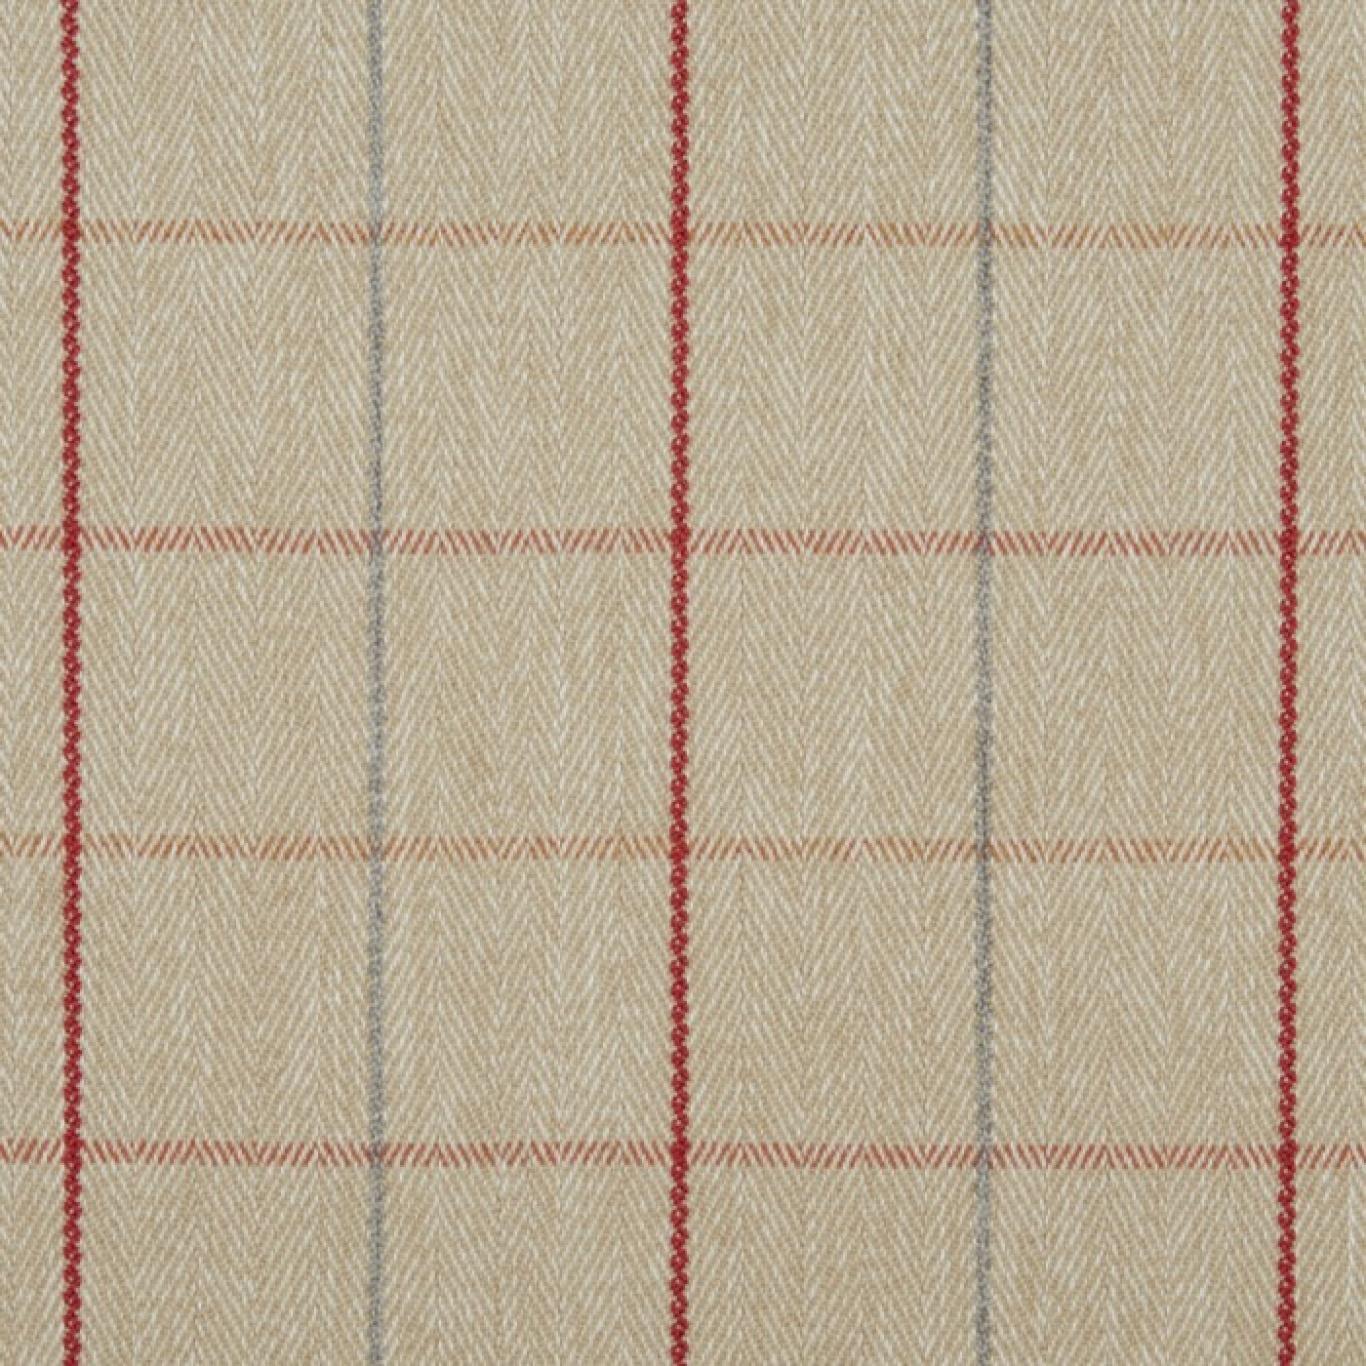 Image of Prestigious Brodie Auburn Fabric